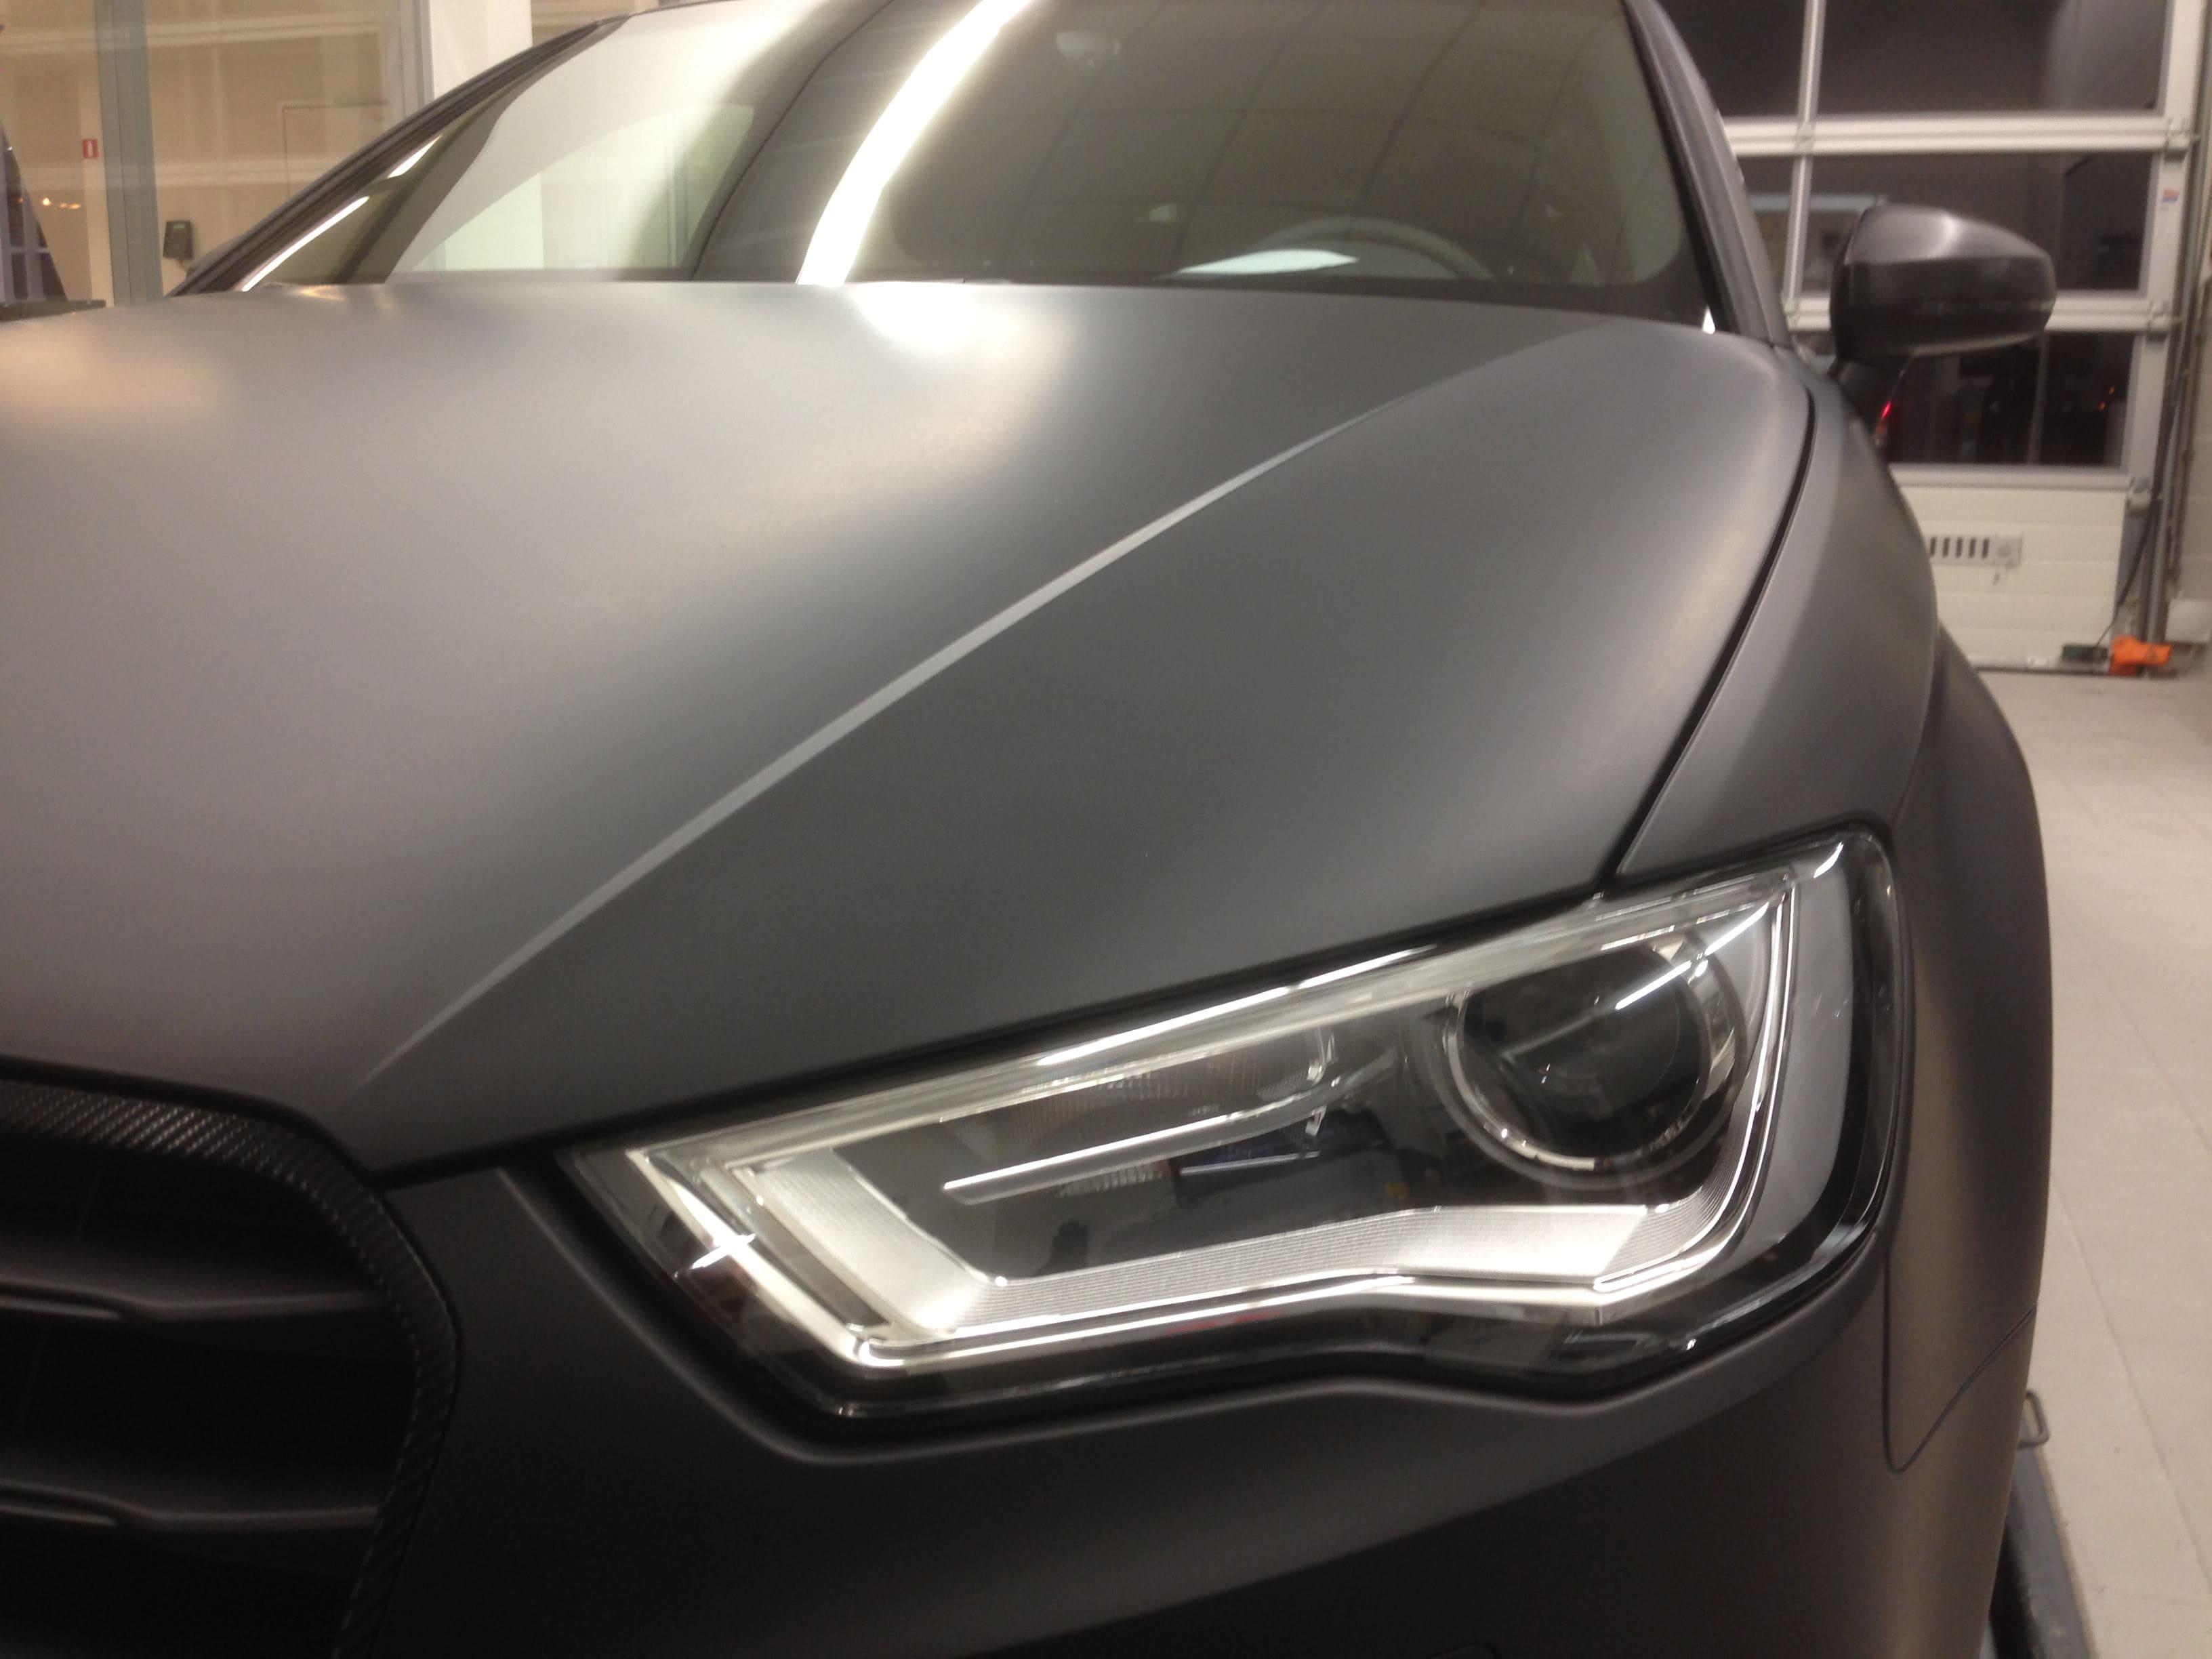 Audi A3 2014 met Mat Zwarte Wrap, Carwrapping door Wrapmyride.nu Foto-nr:4473, ©2021